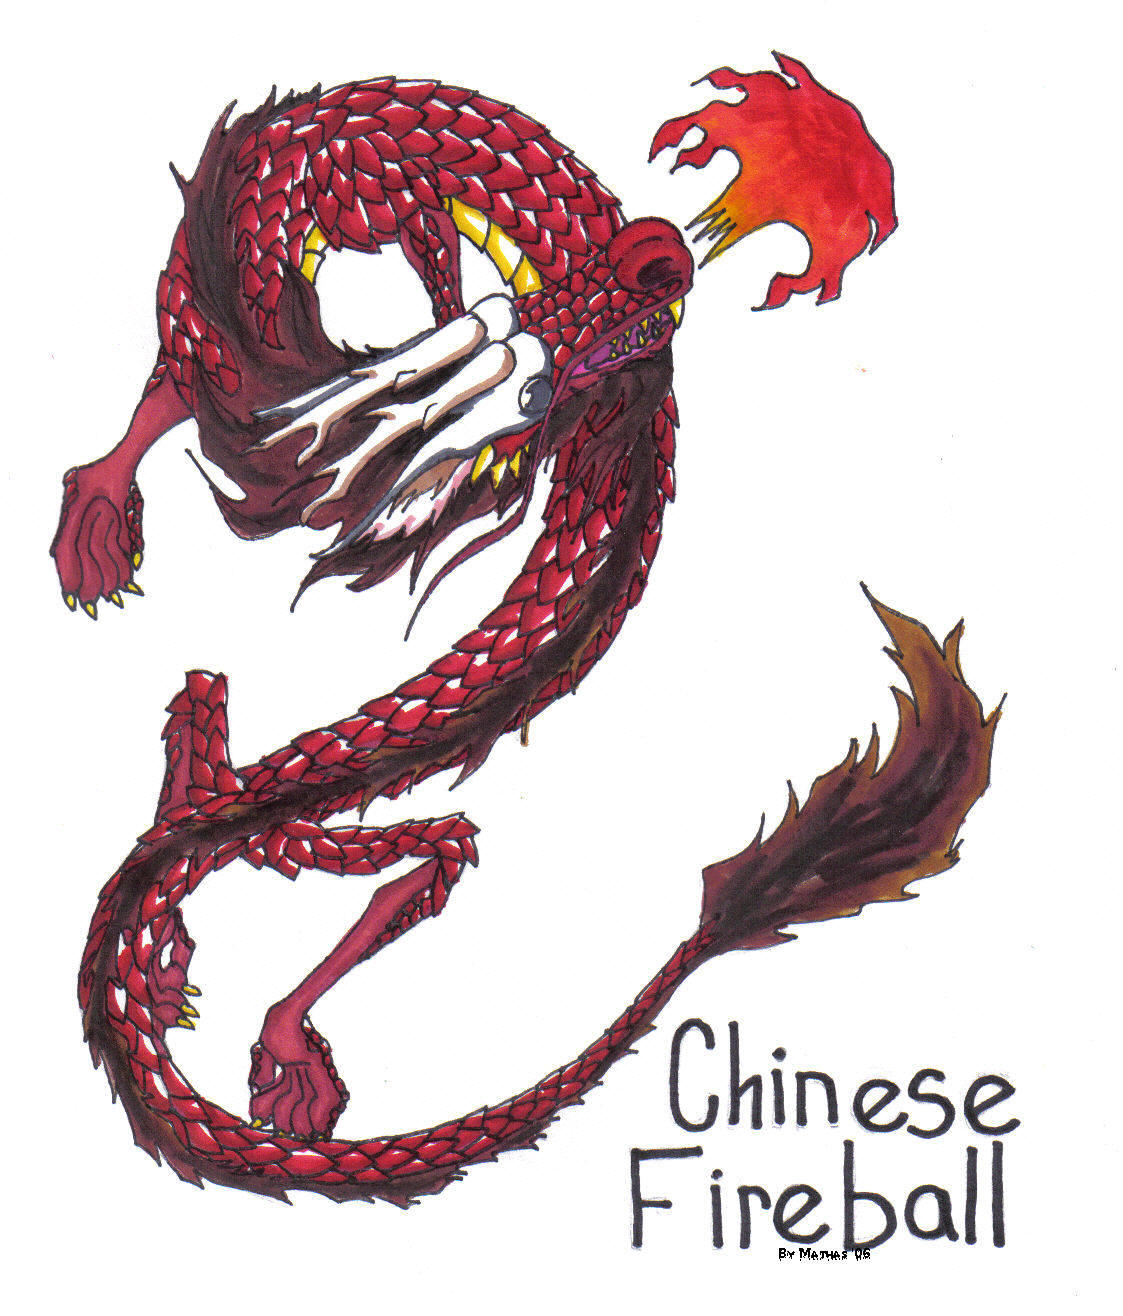 chinese fireball by mathas on deviantart